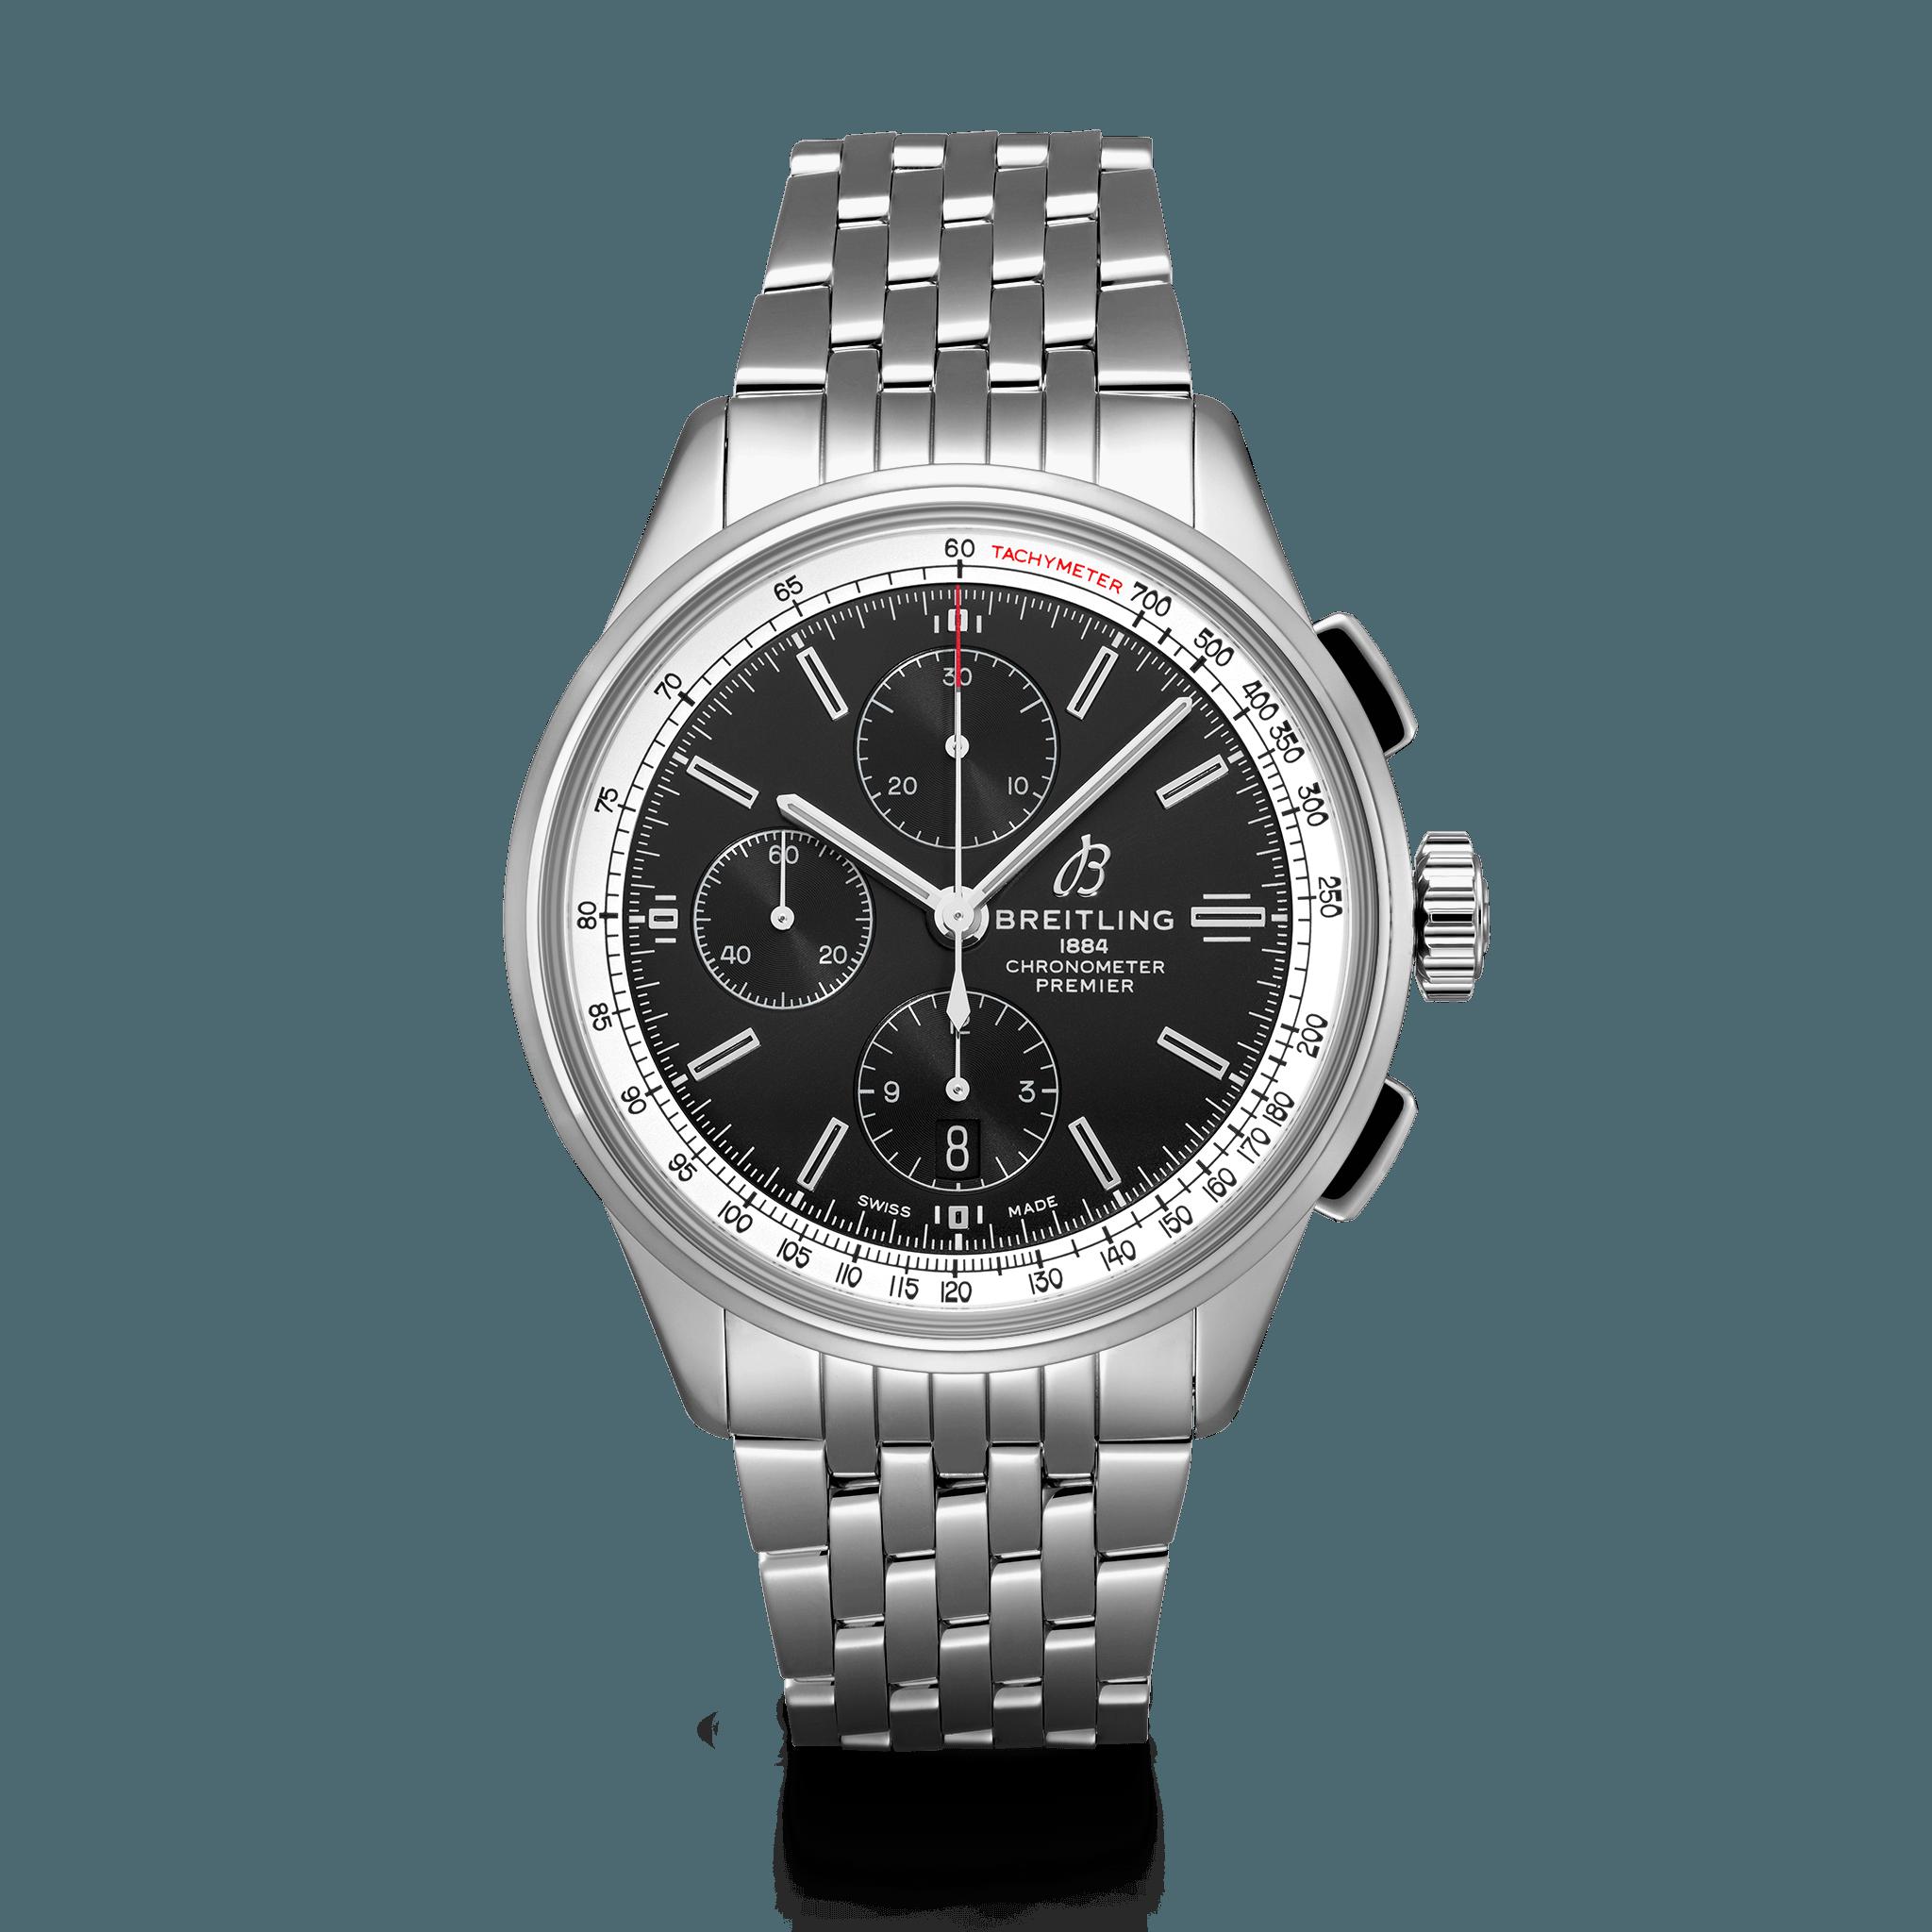 Breitling Premier Chronograaf 42